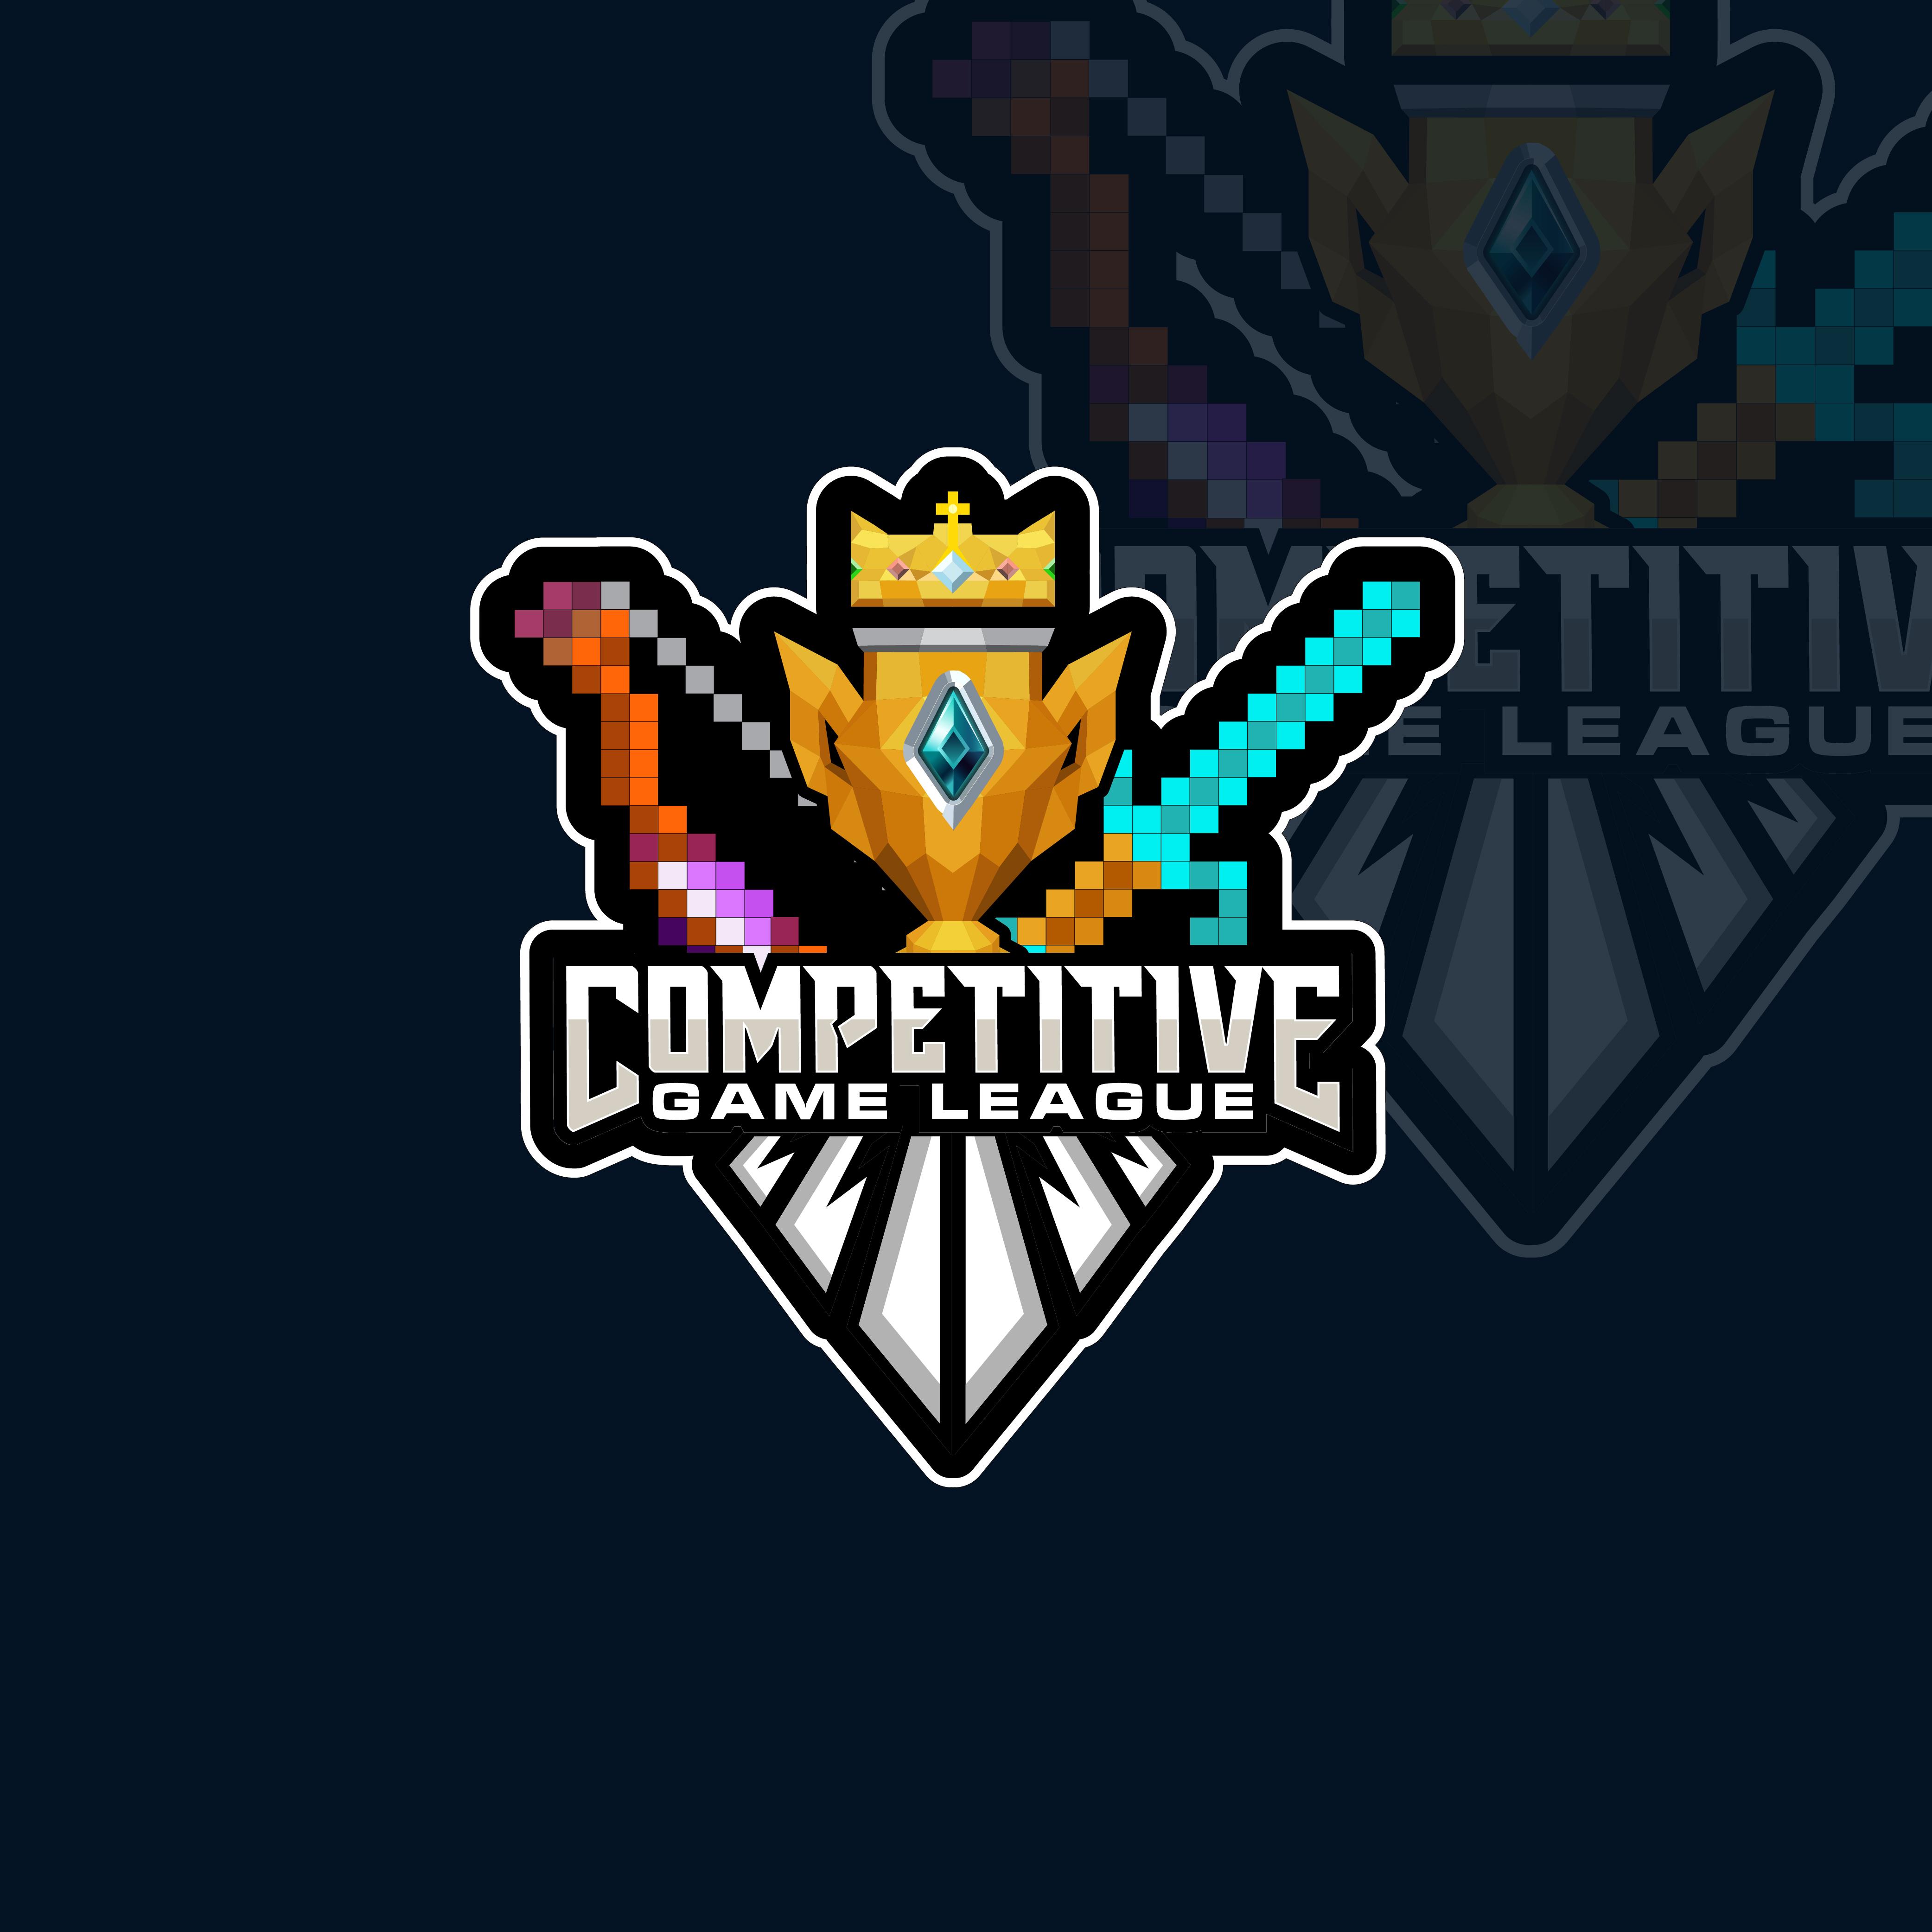 Competitive_Game_League_Rev_10_Final-01.jpg